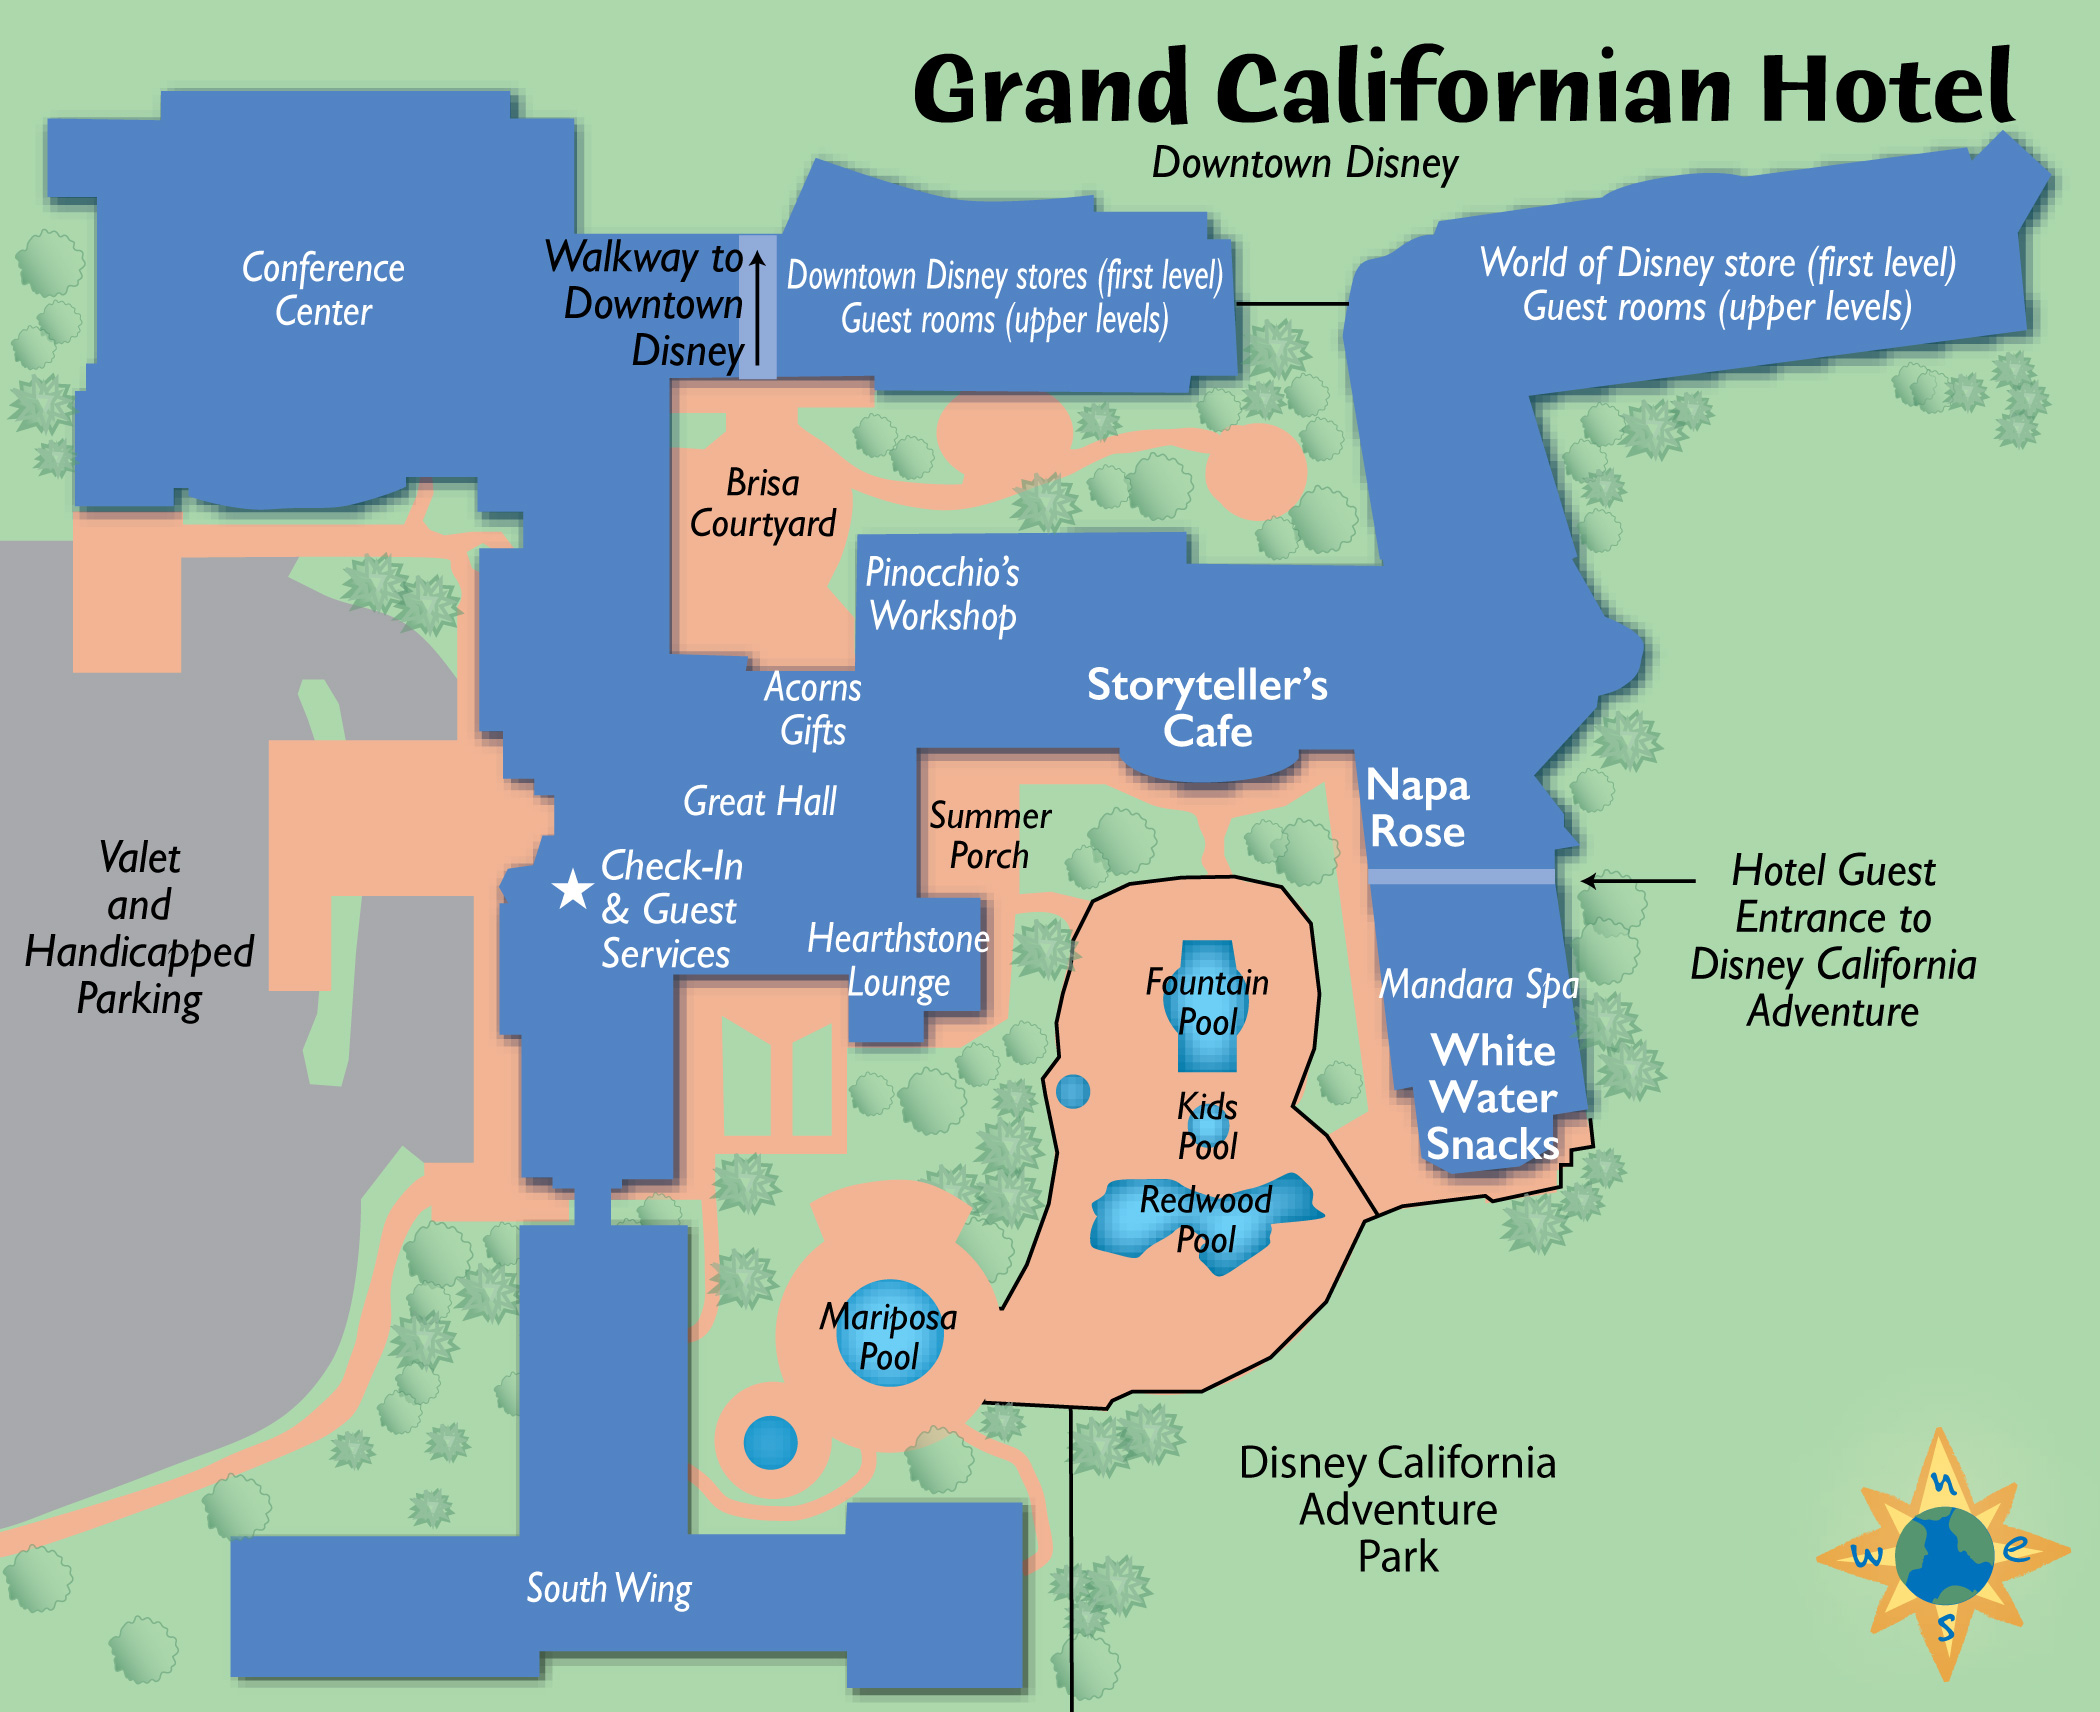 Passporter's Disneylandlive! Guide: Always Up-To-Date! - California Hotel Map